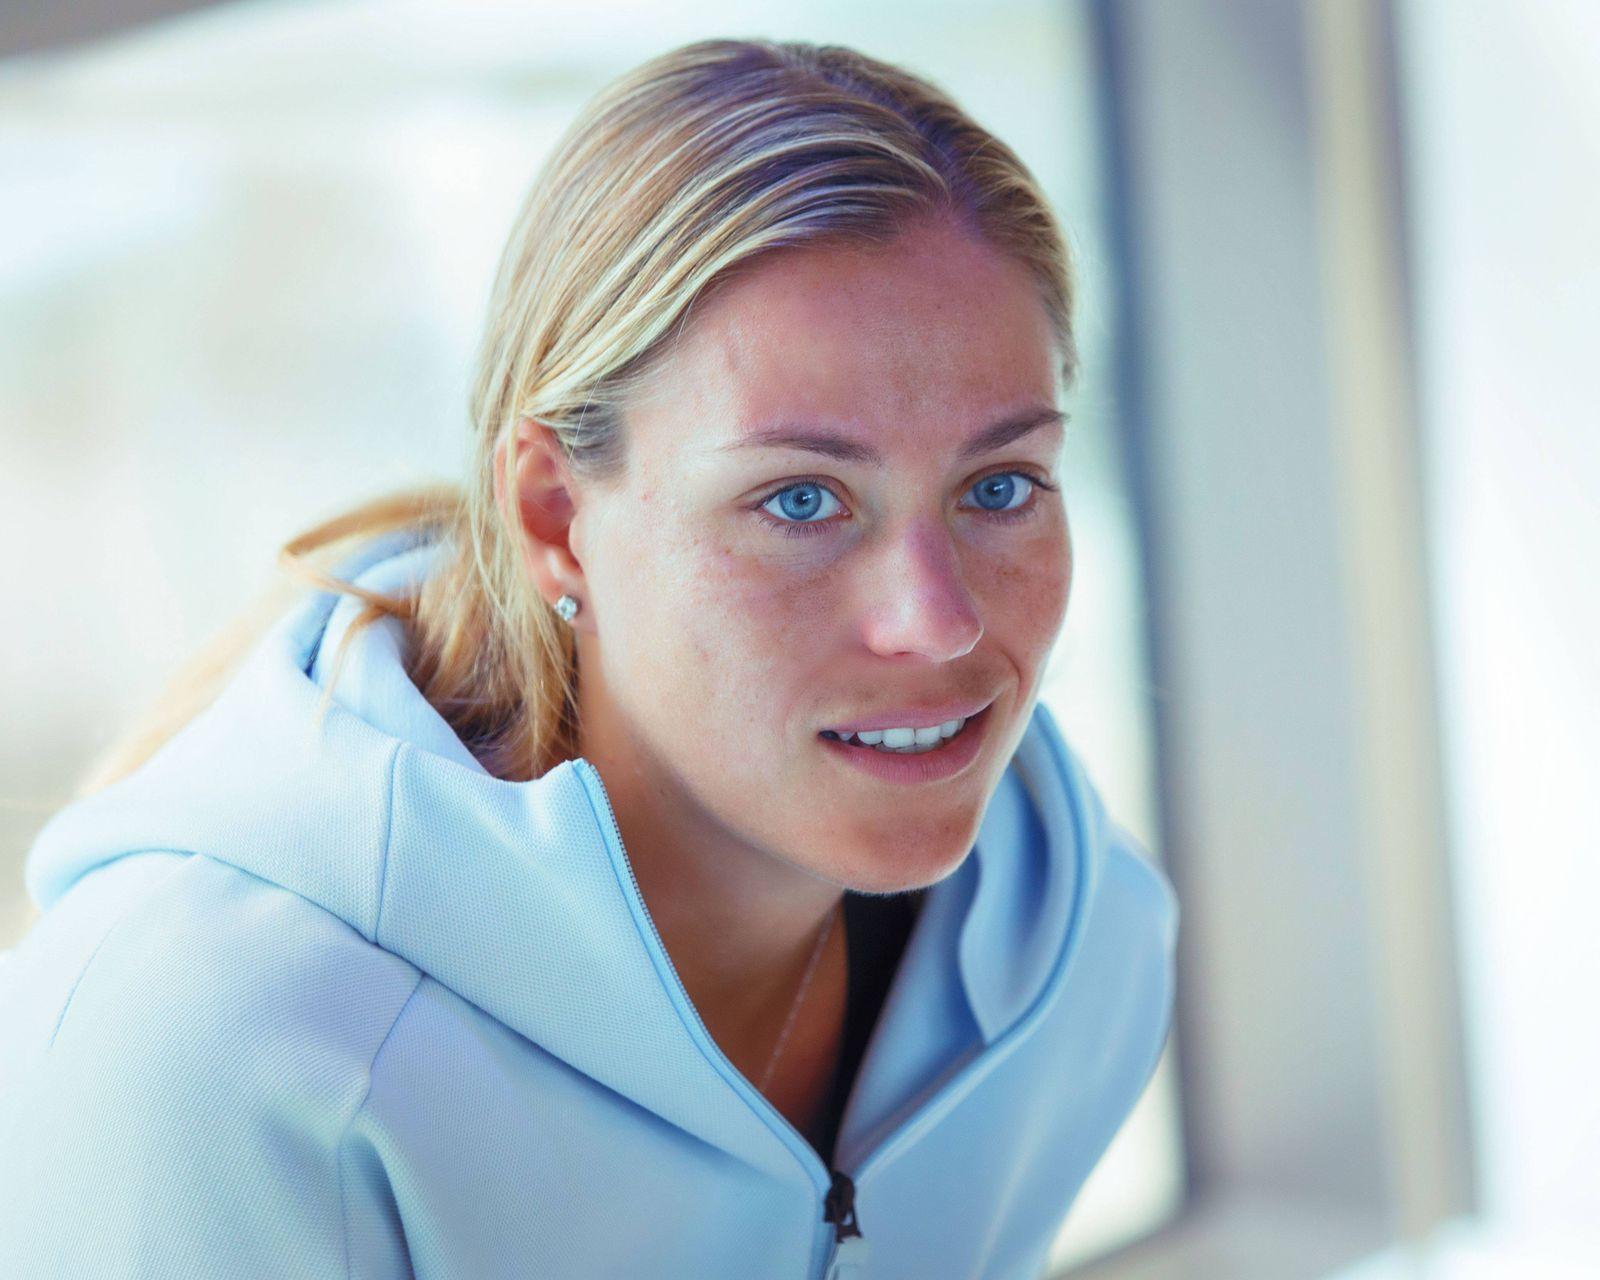 Bilder des Tages SPORT WTA Turnier in Dubai Fotoshooting Angelique Kerber ANGELIQUE KERBER GER